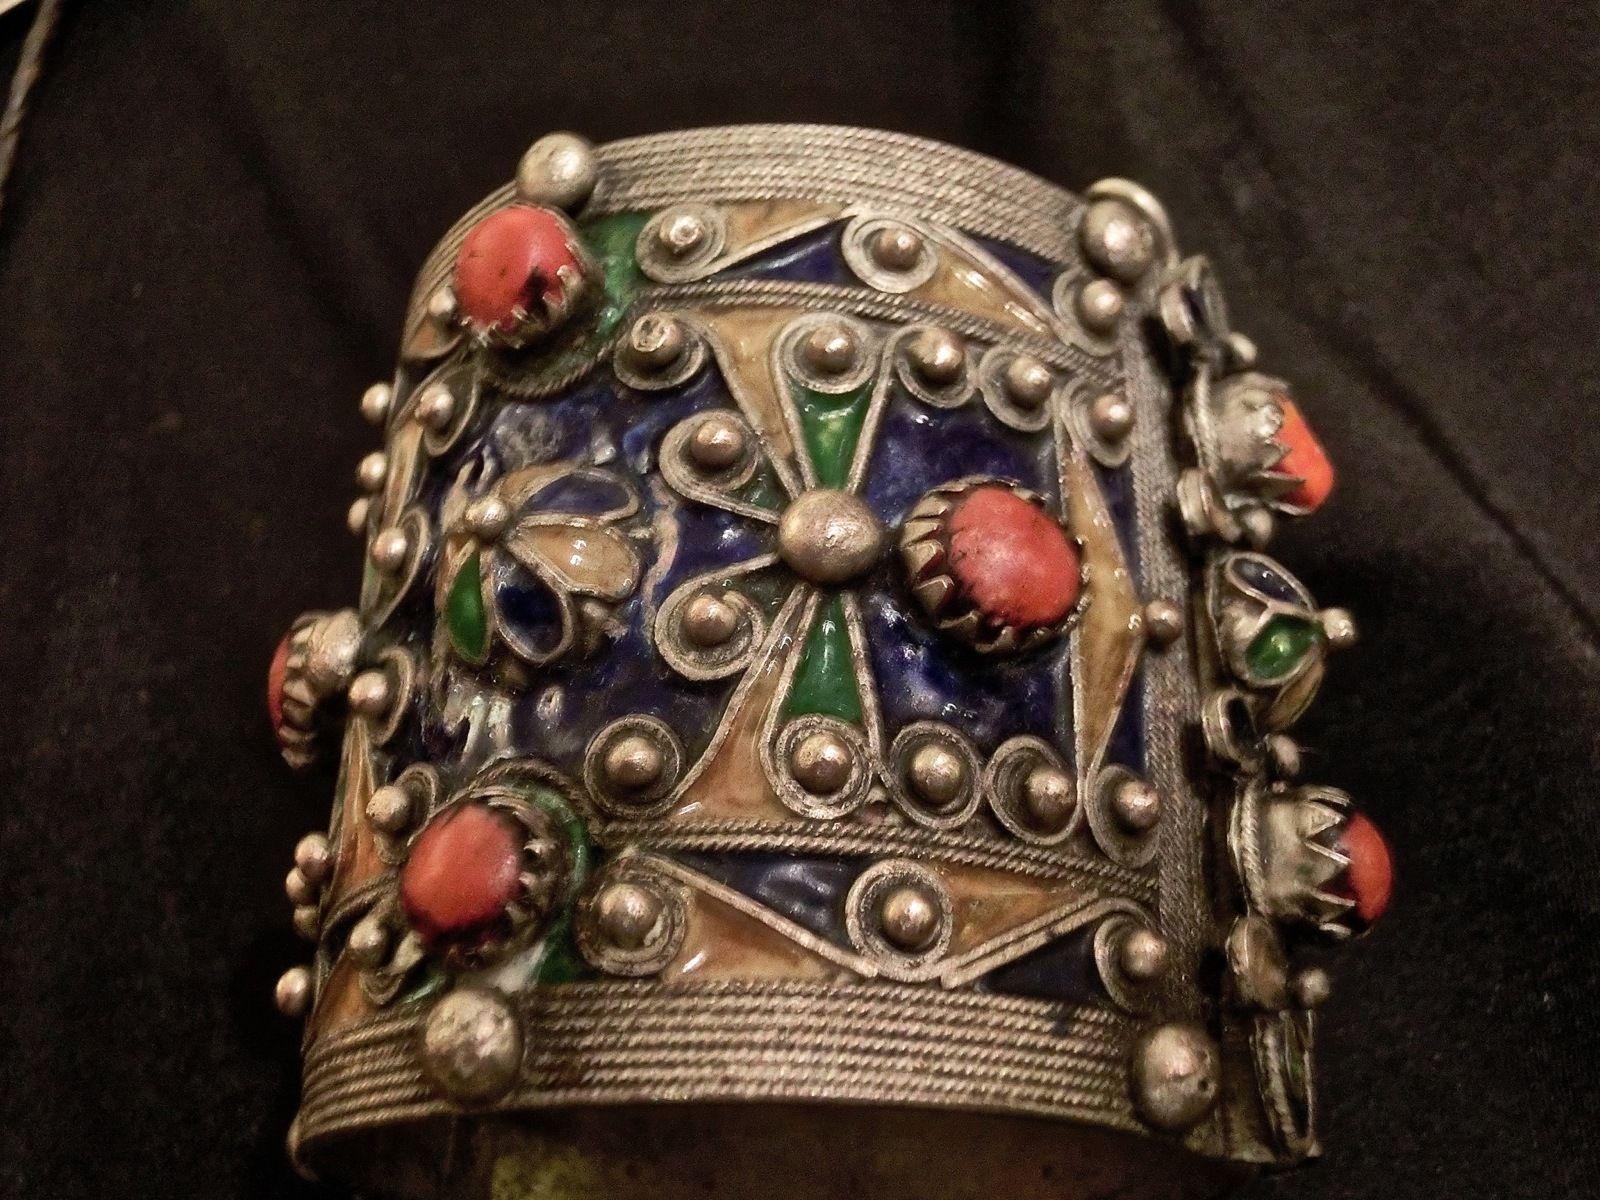 Bijoux Algerie Argent : Amechloukh bracelet kabyle argent kabylie beni yenni